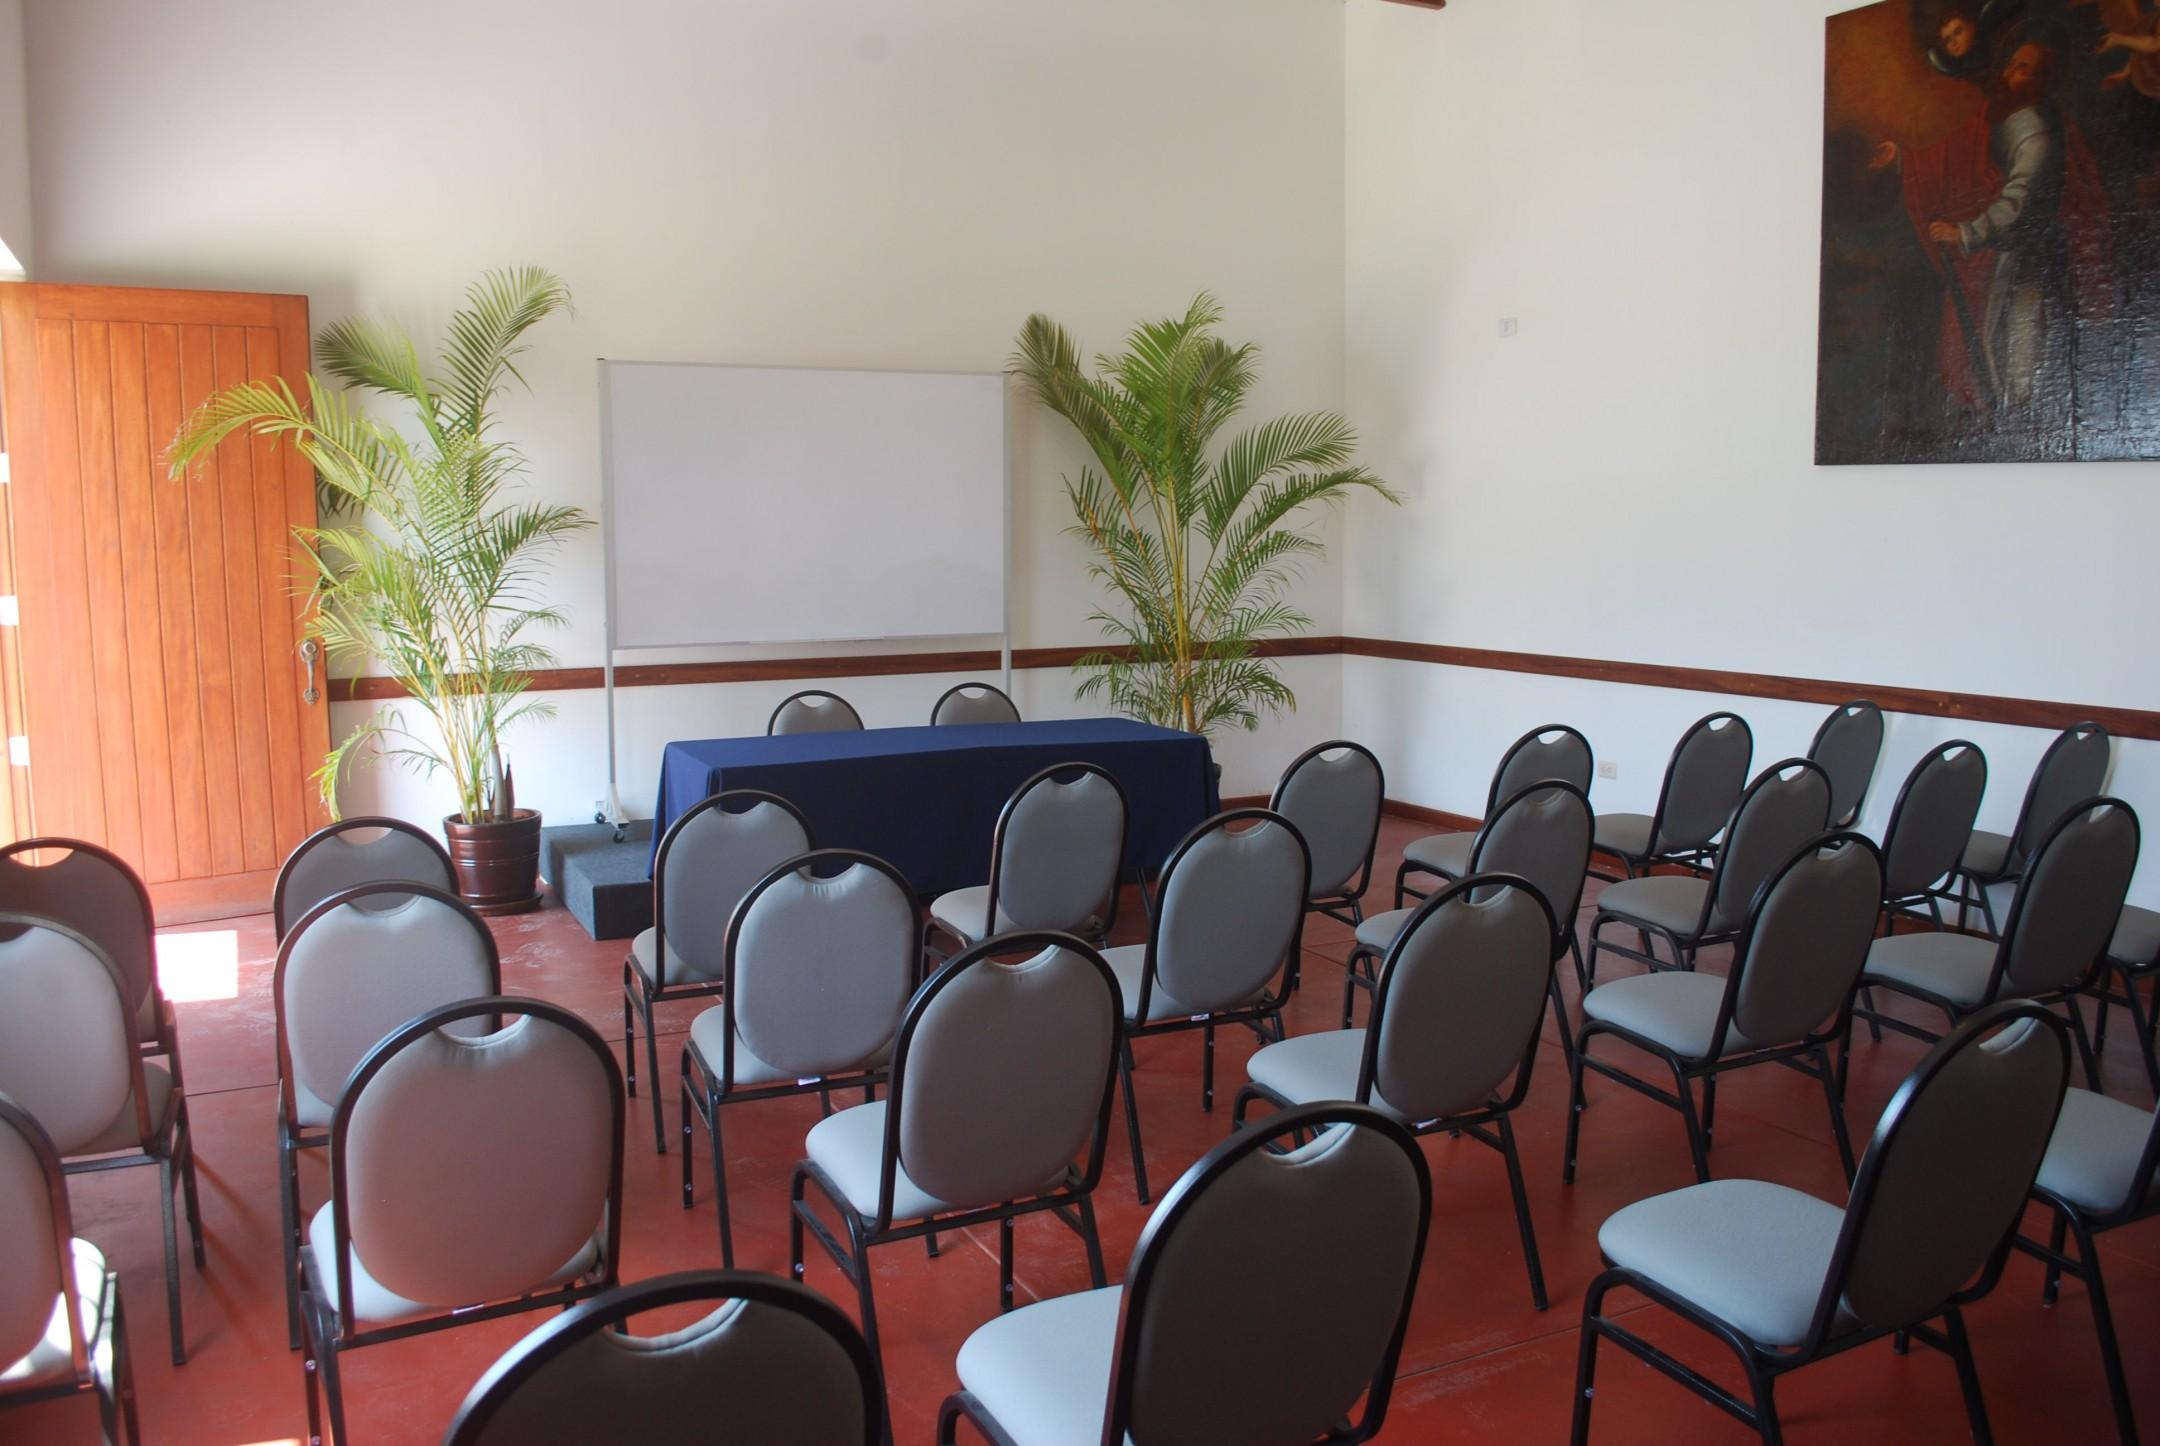 http://haciendabocanegra.com/images/chbn_UQV134nvEB_large-1080_4hpyW.JPG